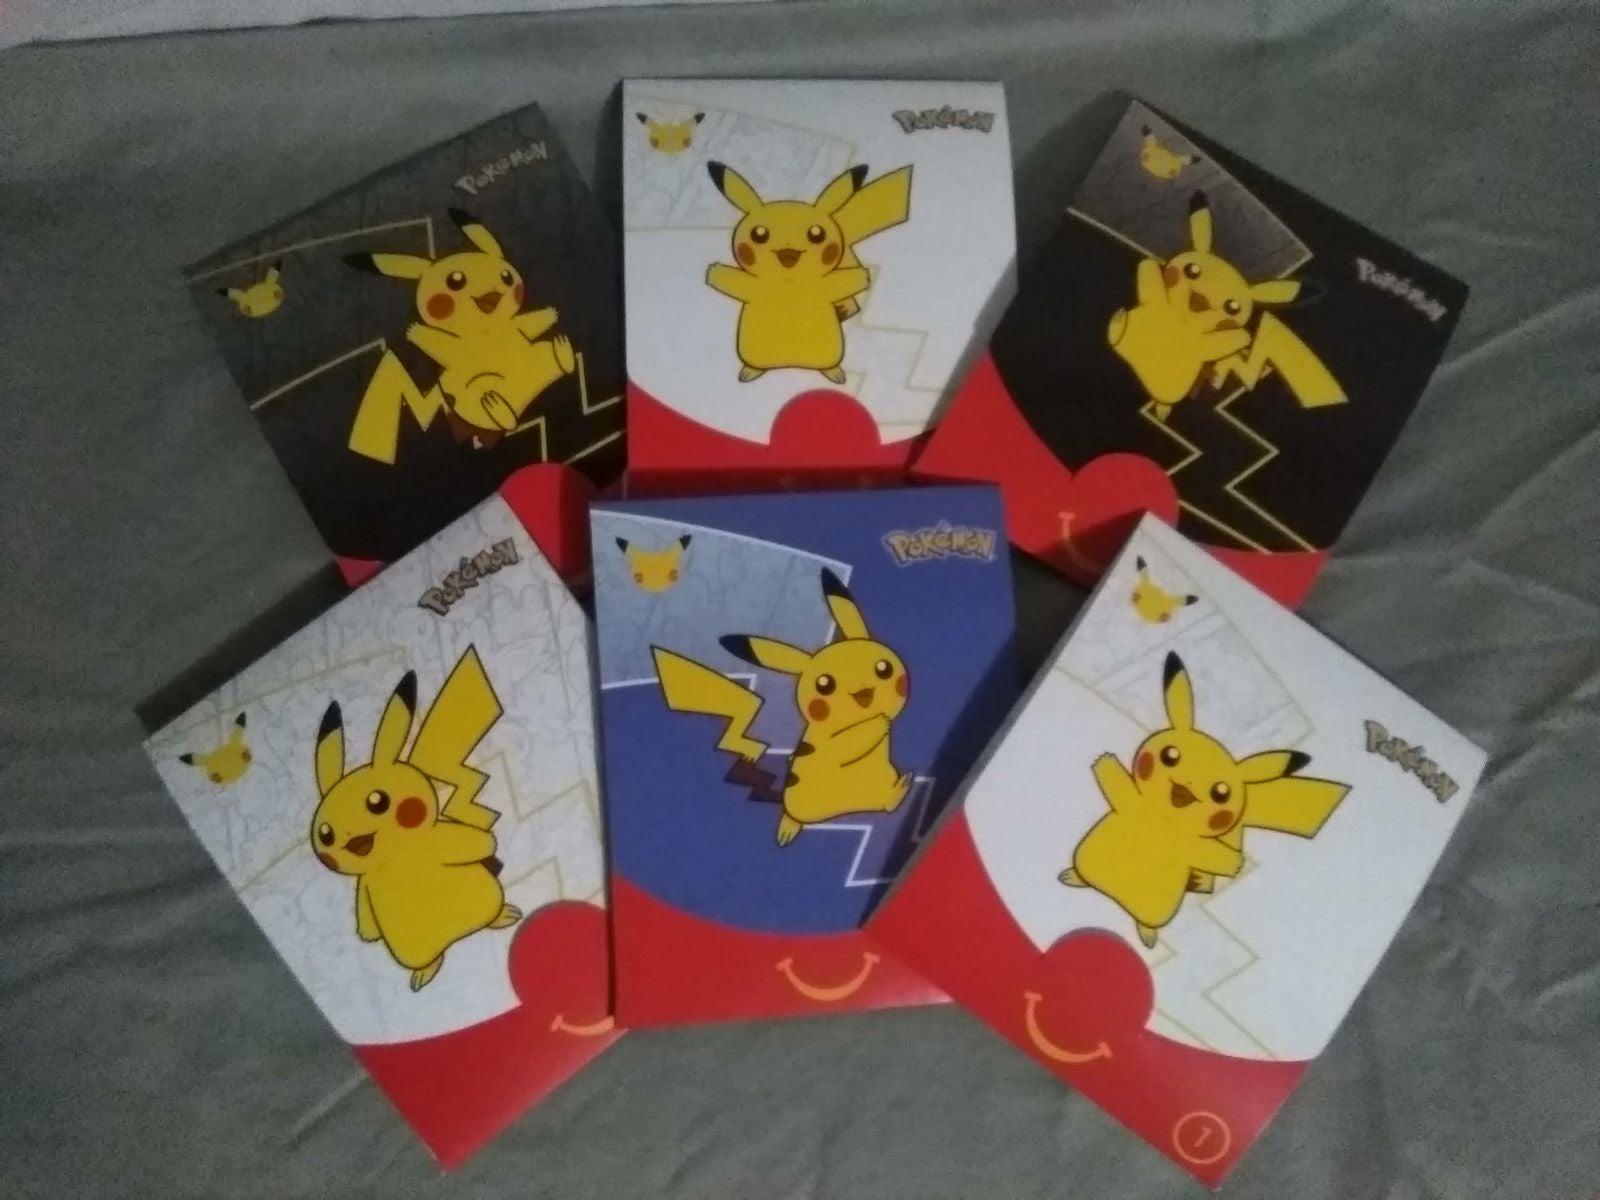 x6 McDonald's Pokemon Packs